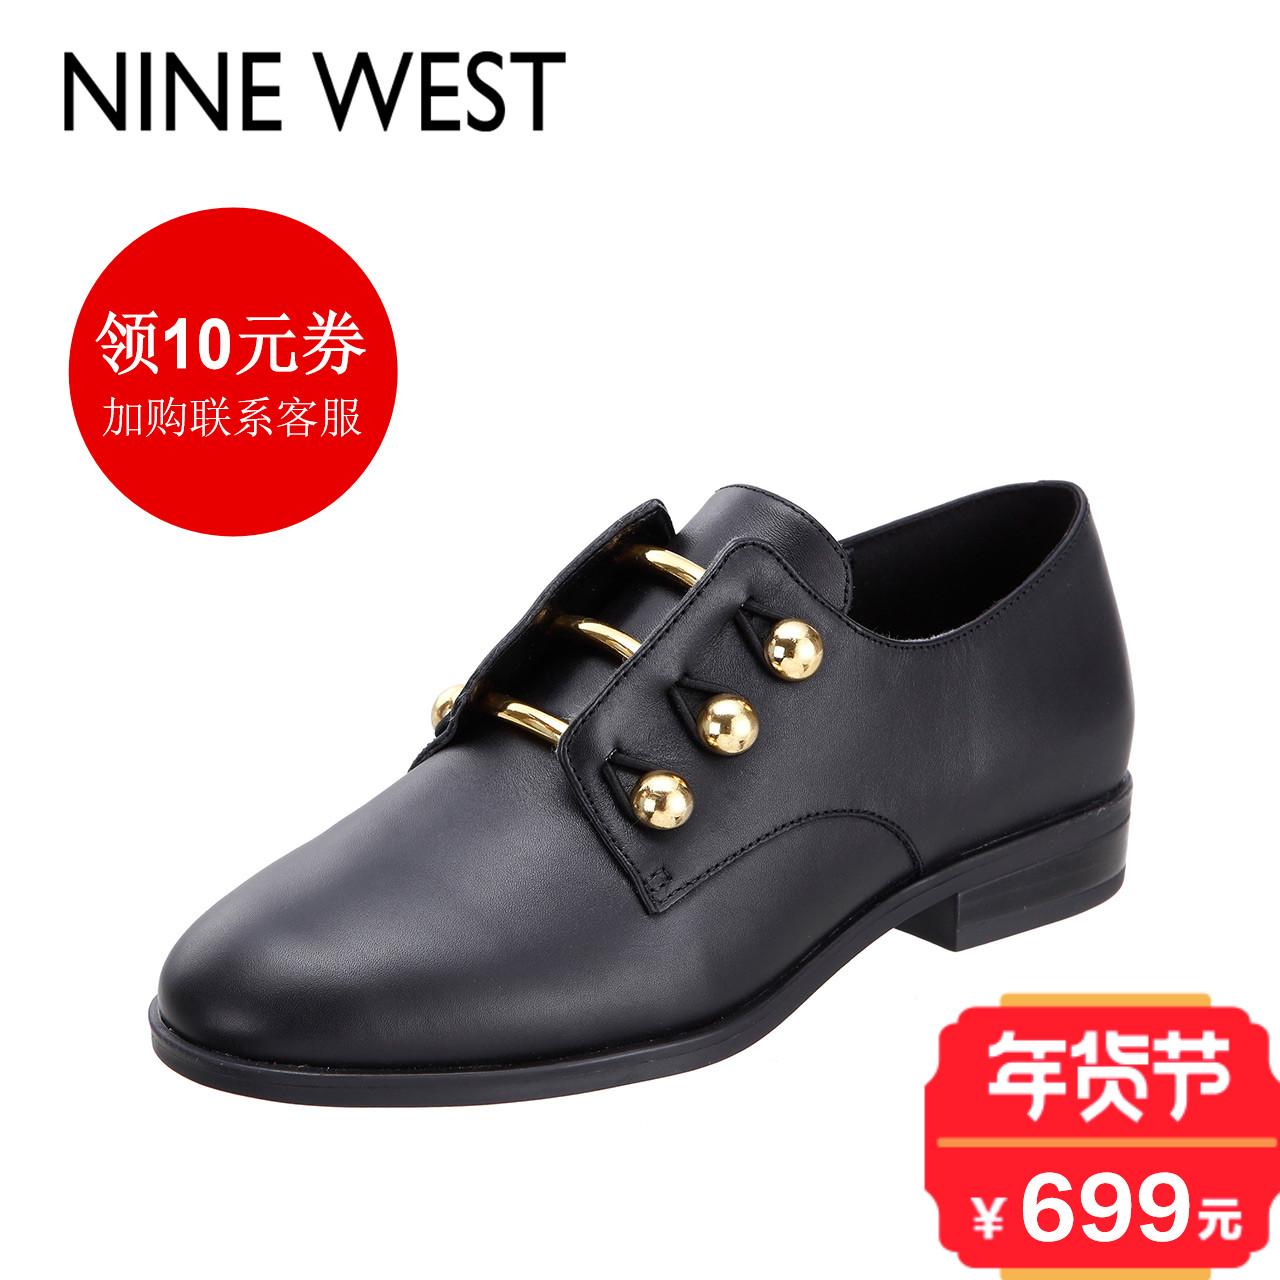 Nine West/玖熙2017秋冬新款平跟布洛克单鞋 英伦风皮鞋 单鞋女